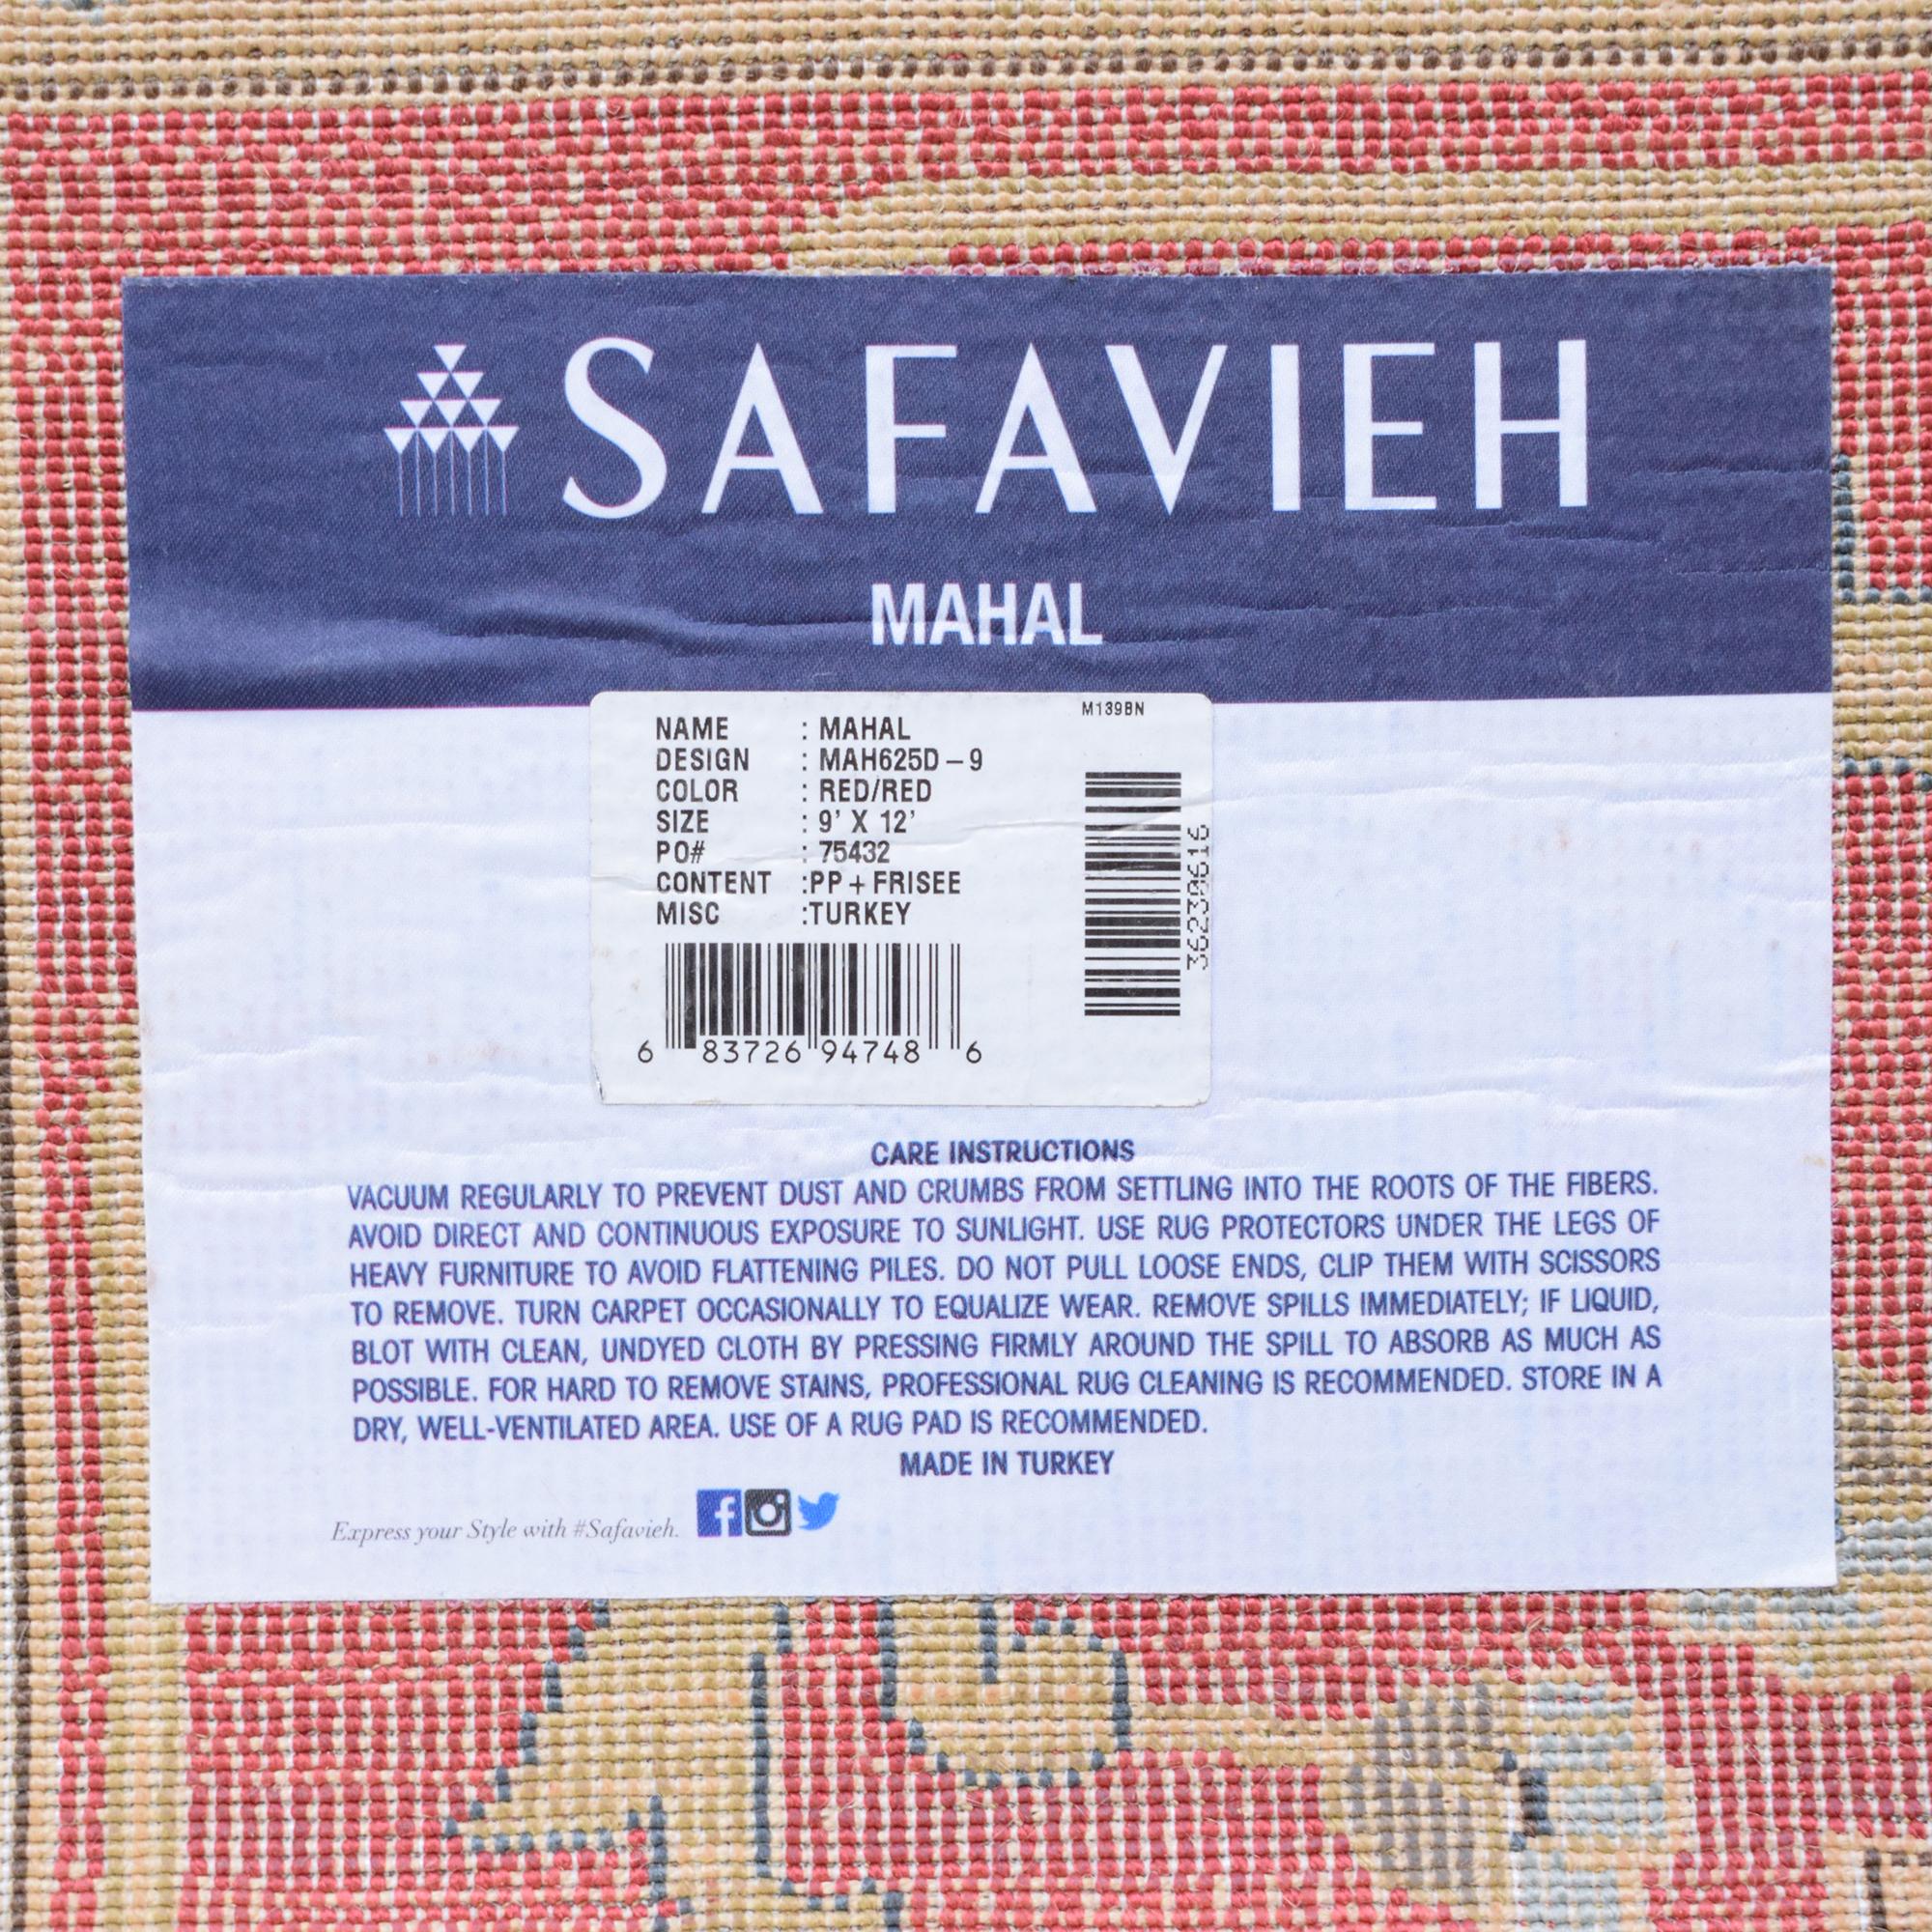 Safavieh Safavieh Mahal 9x12 Rug Rugs